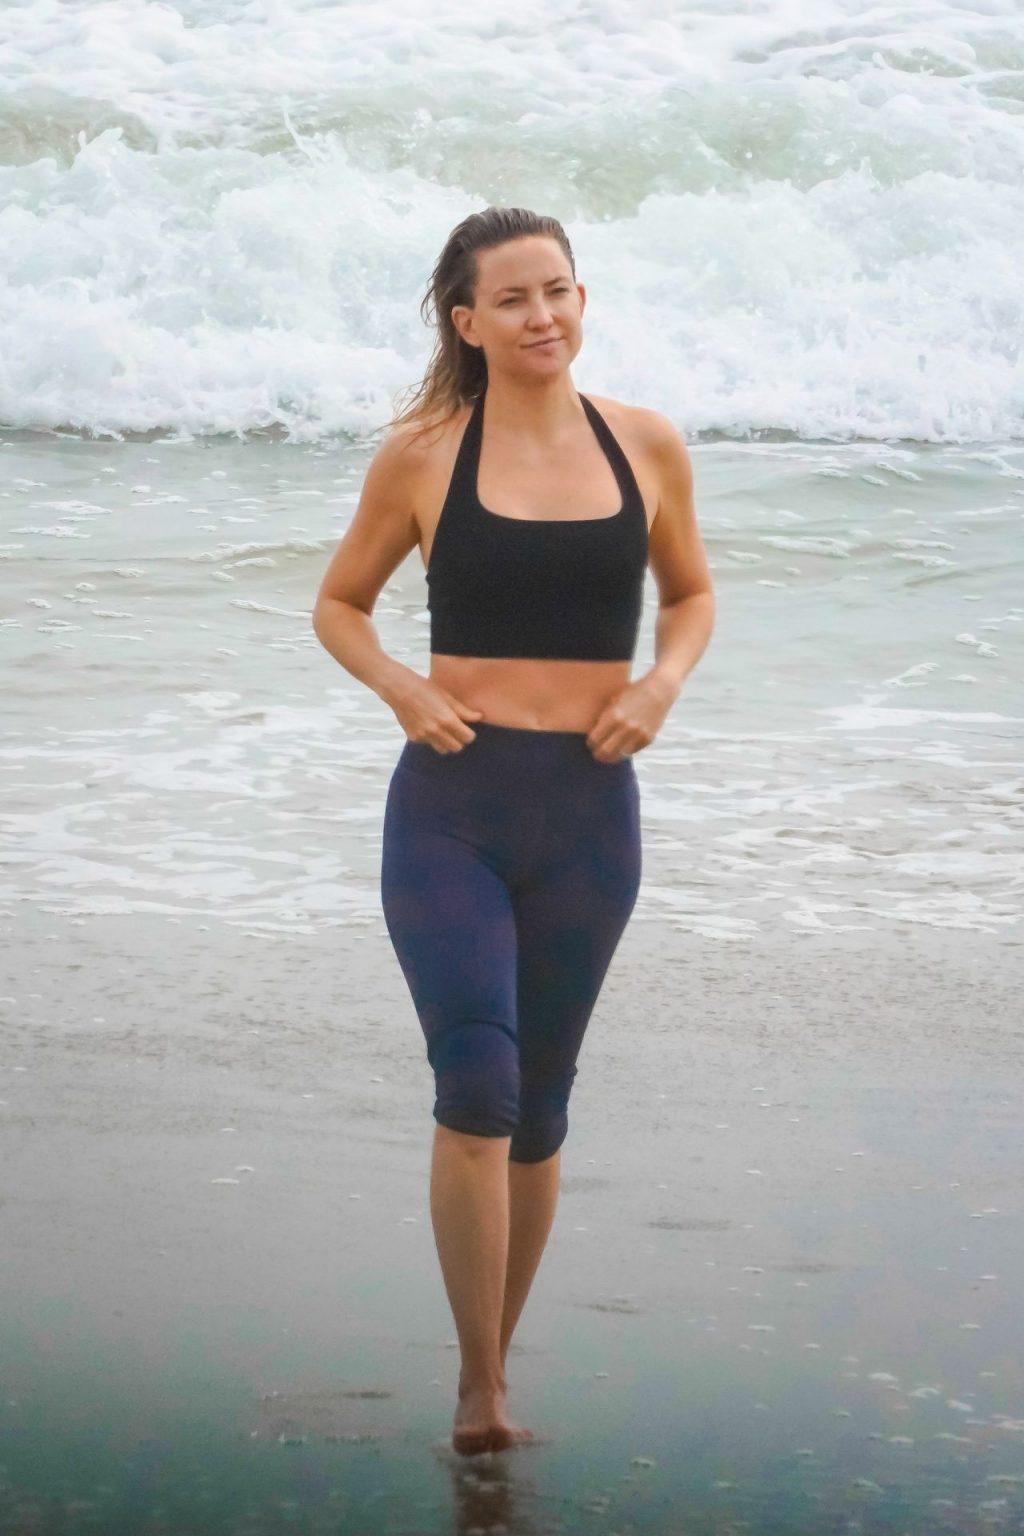 Kate Hudson Shows Off Her Killer Body in Malibu (41 Photos)